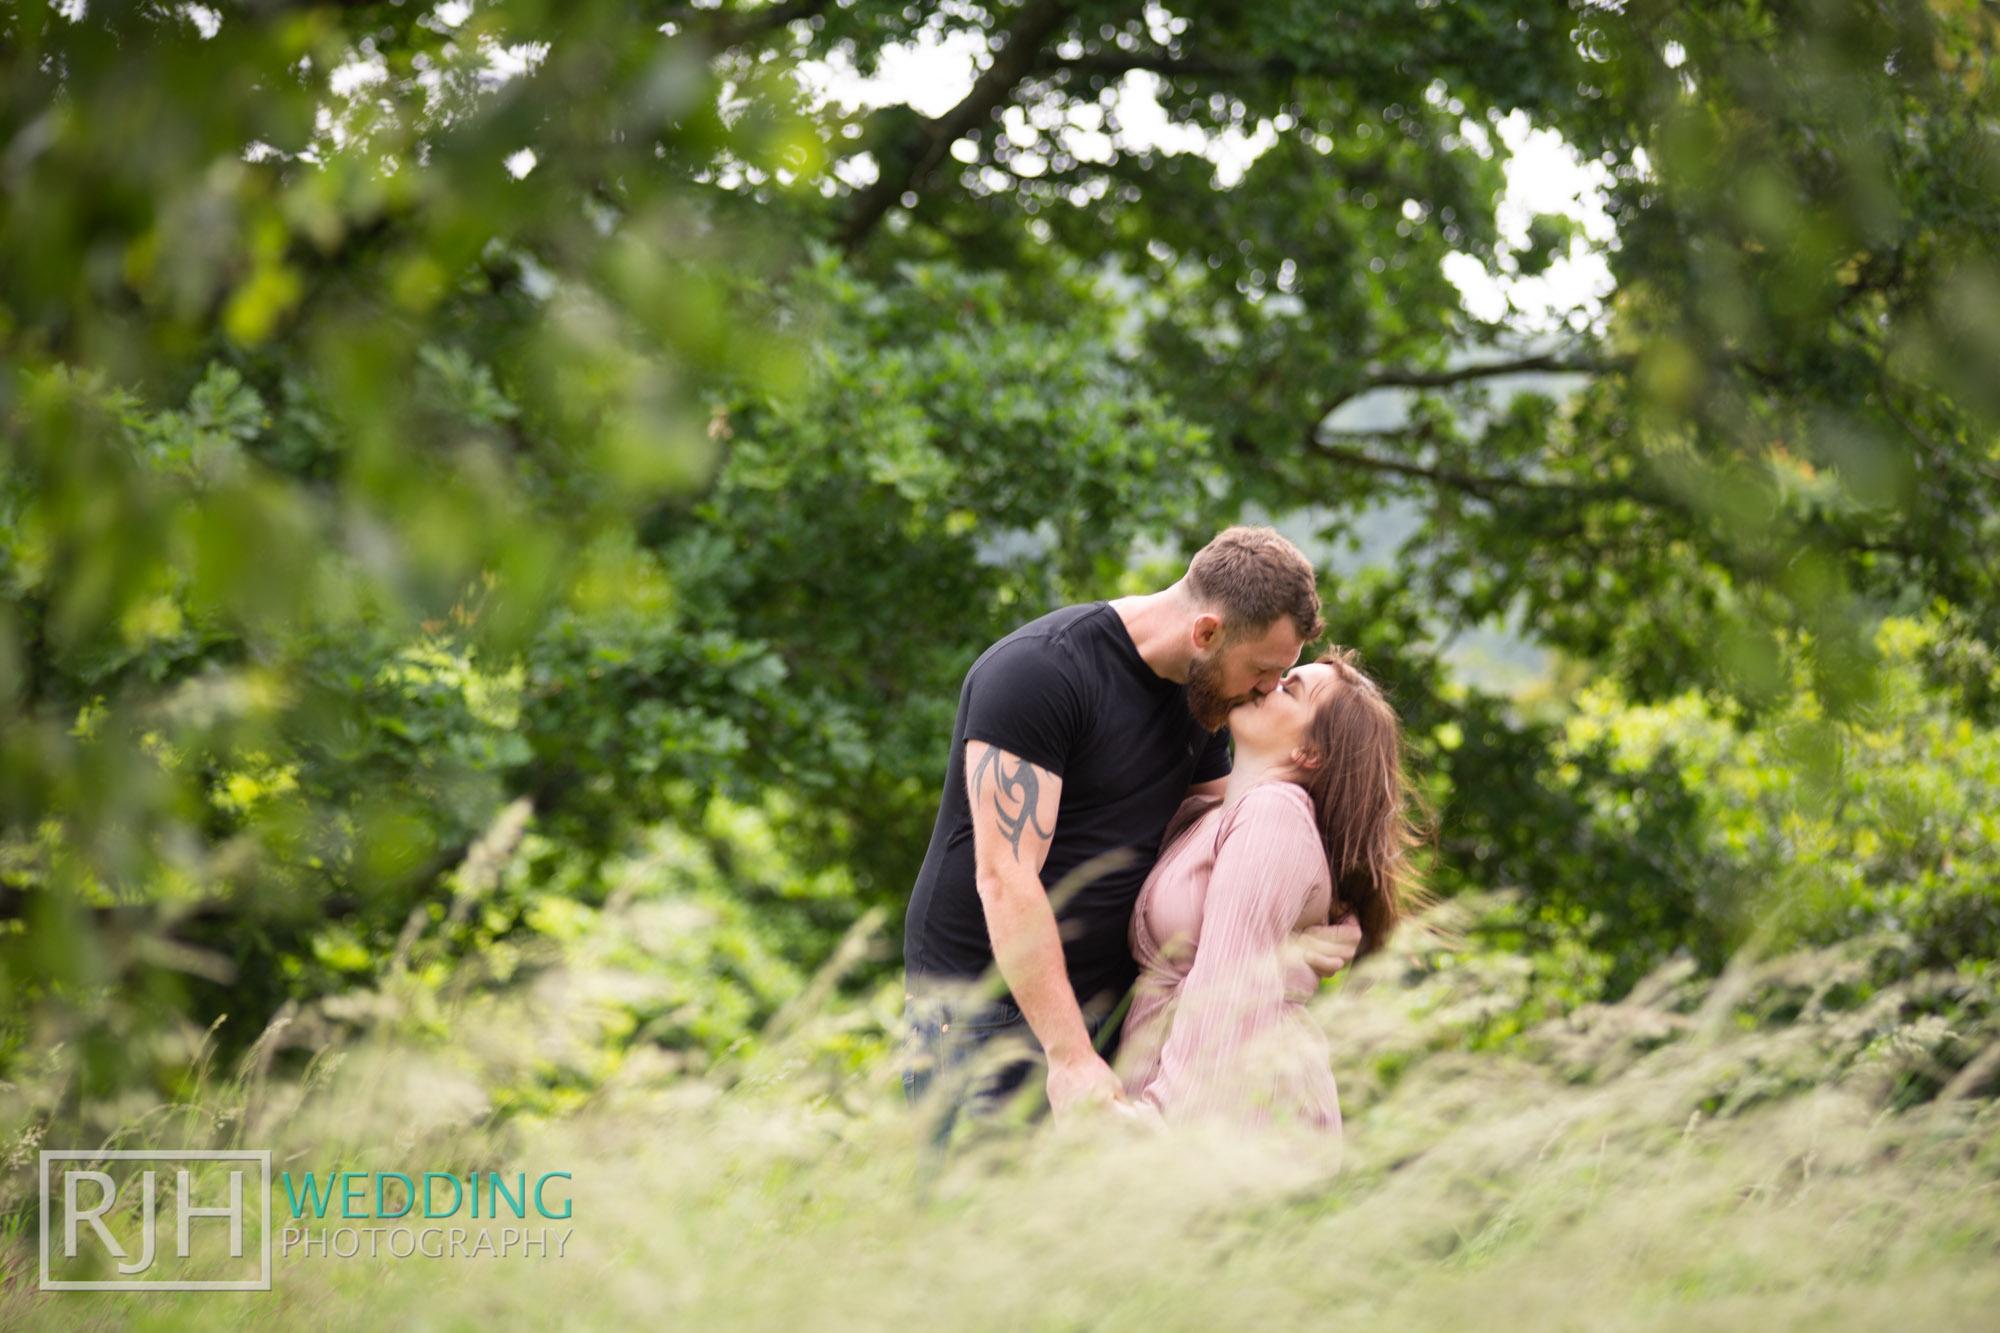 Osmaston Park Wedding Photographer - Jodie & Oli_010_IMG_7507.jpg